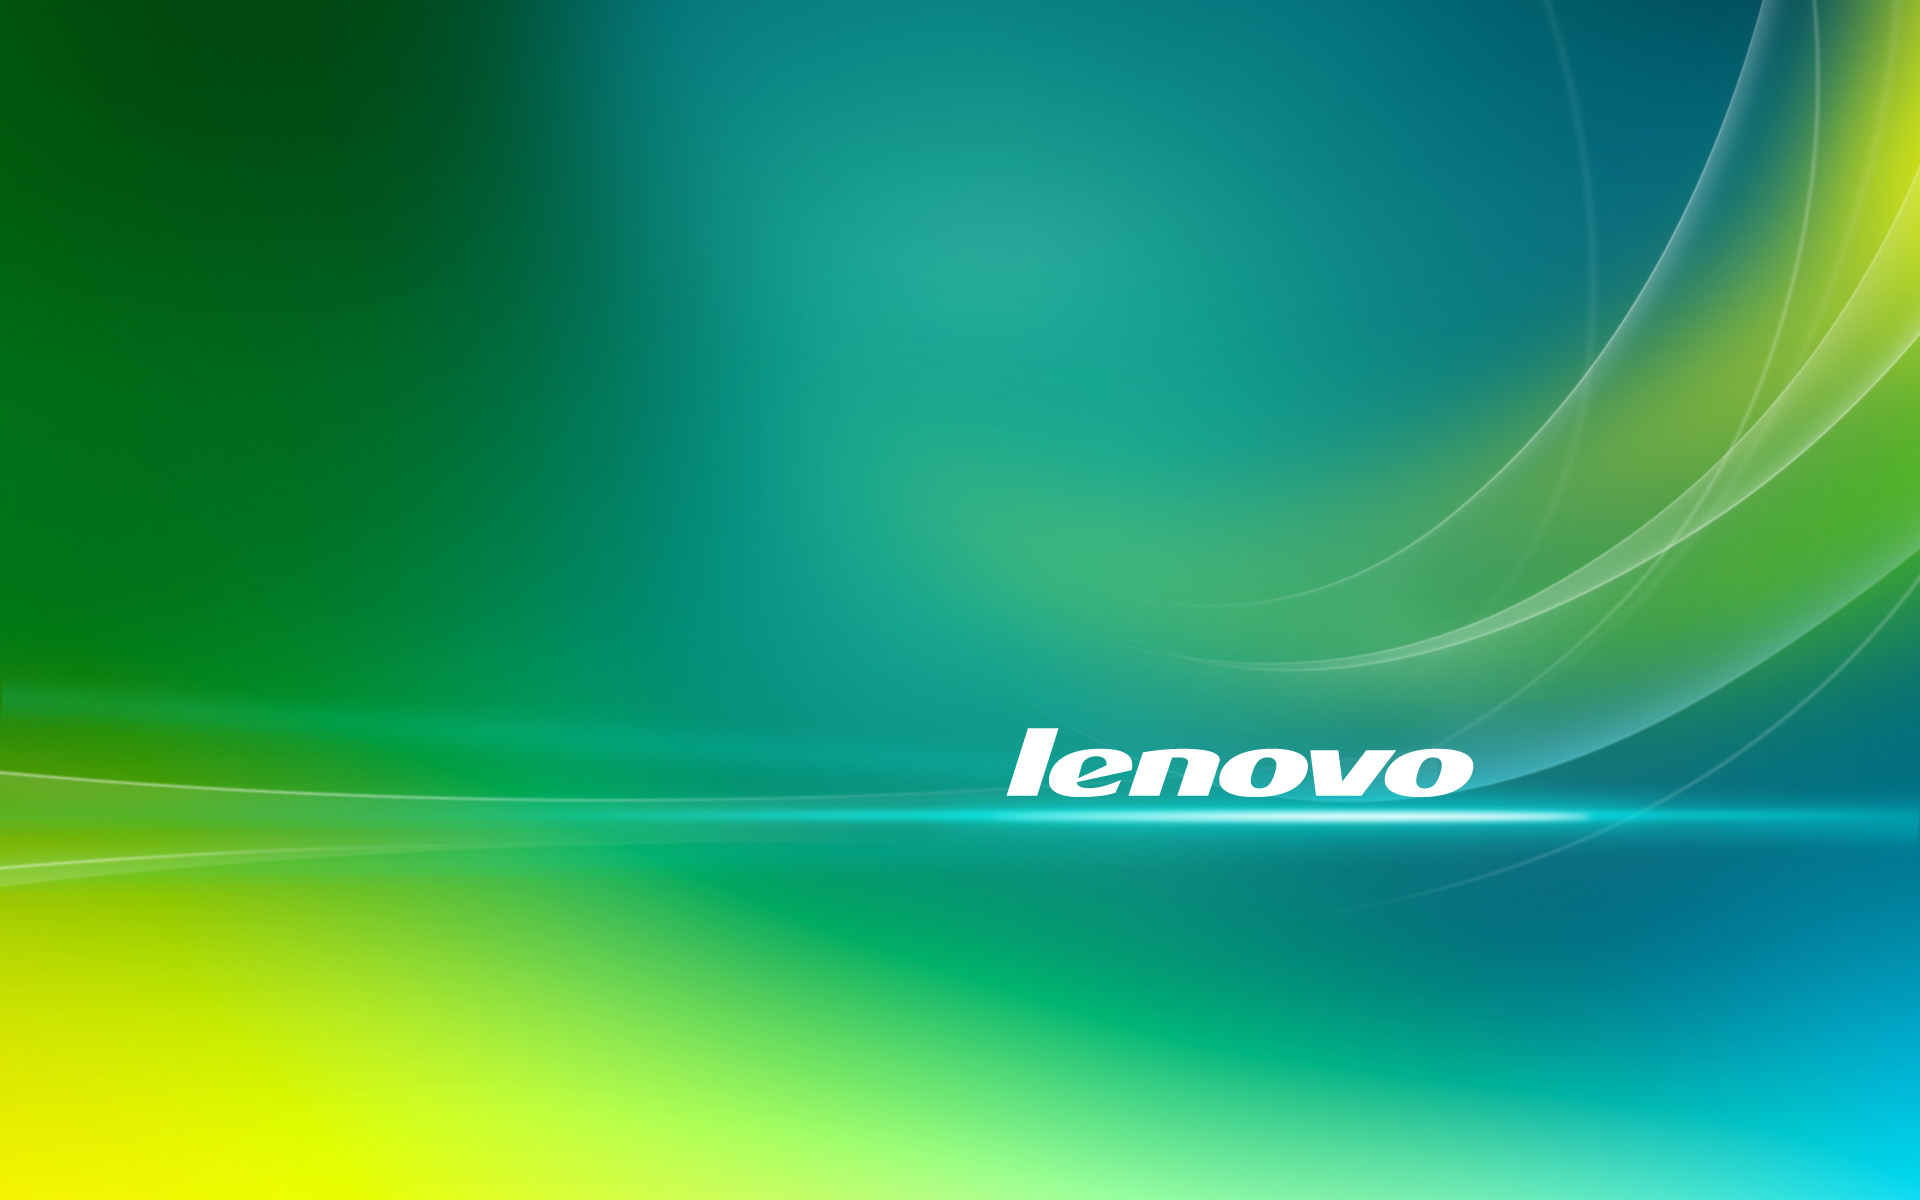 Lenovo Windows 7 Wallpaper